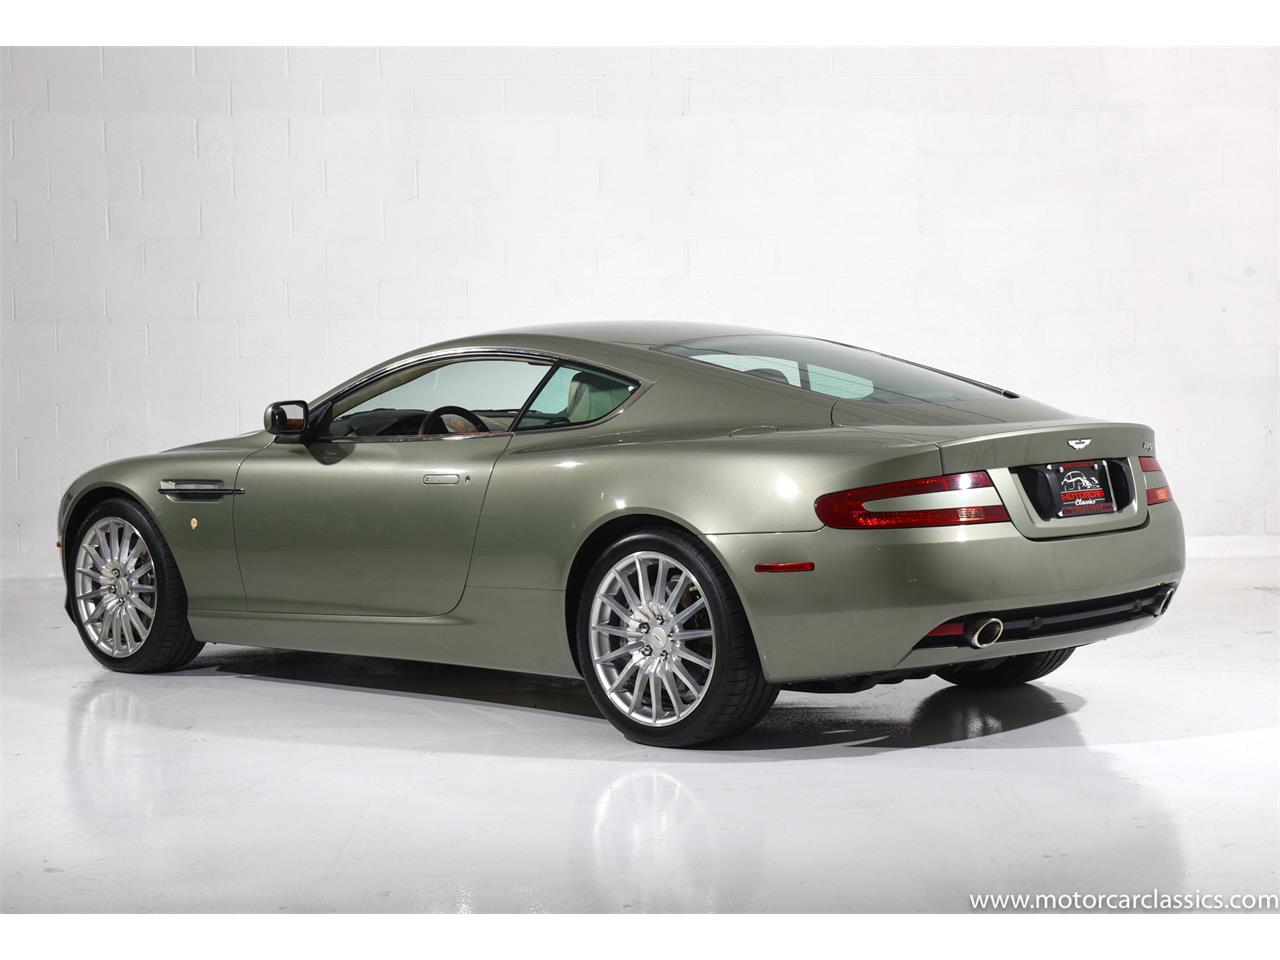 2005 Aston Martin DB9 (CC-1414465) for sale in Farmingdale, New York